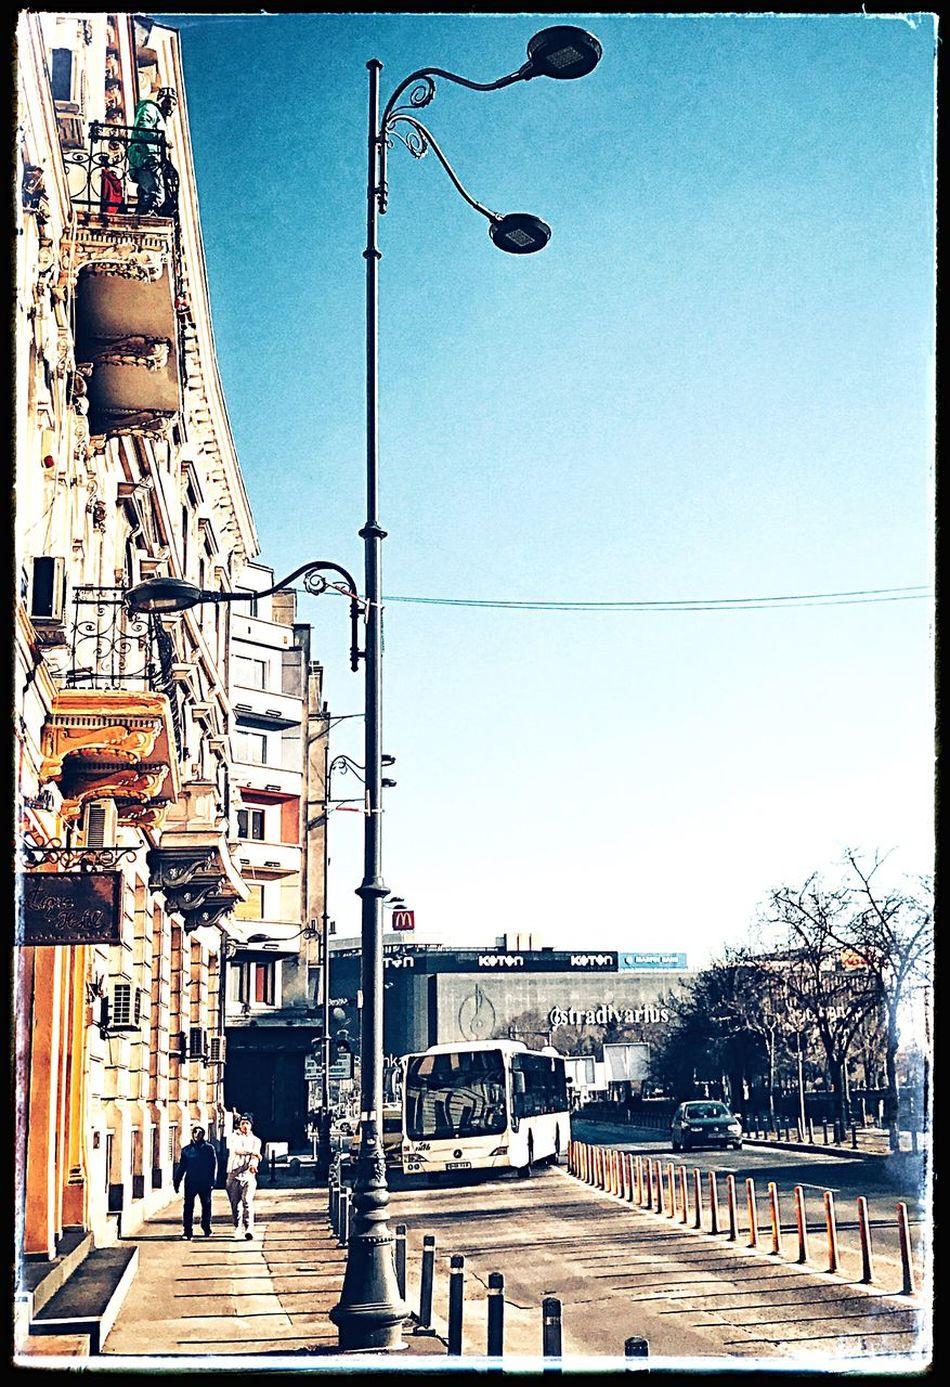 Sunny Day City Bus City Buildings Lamp Post Bucharest Piata Unirii Clear Sky Old Buildings